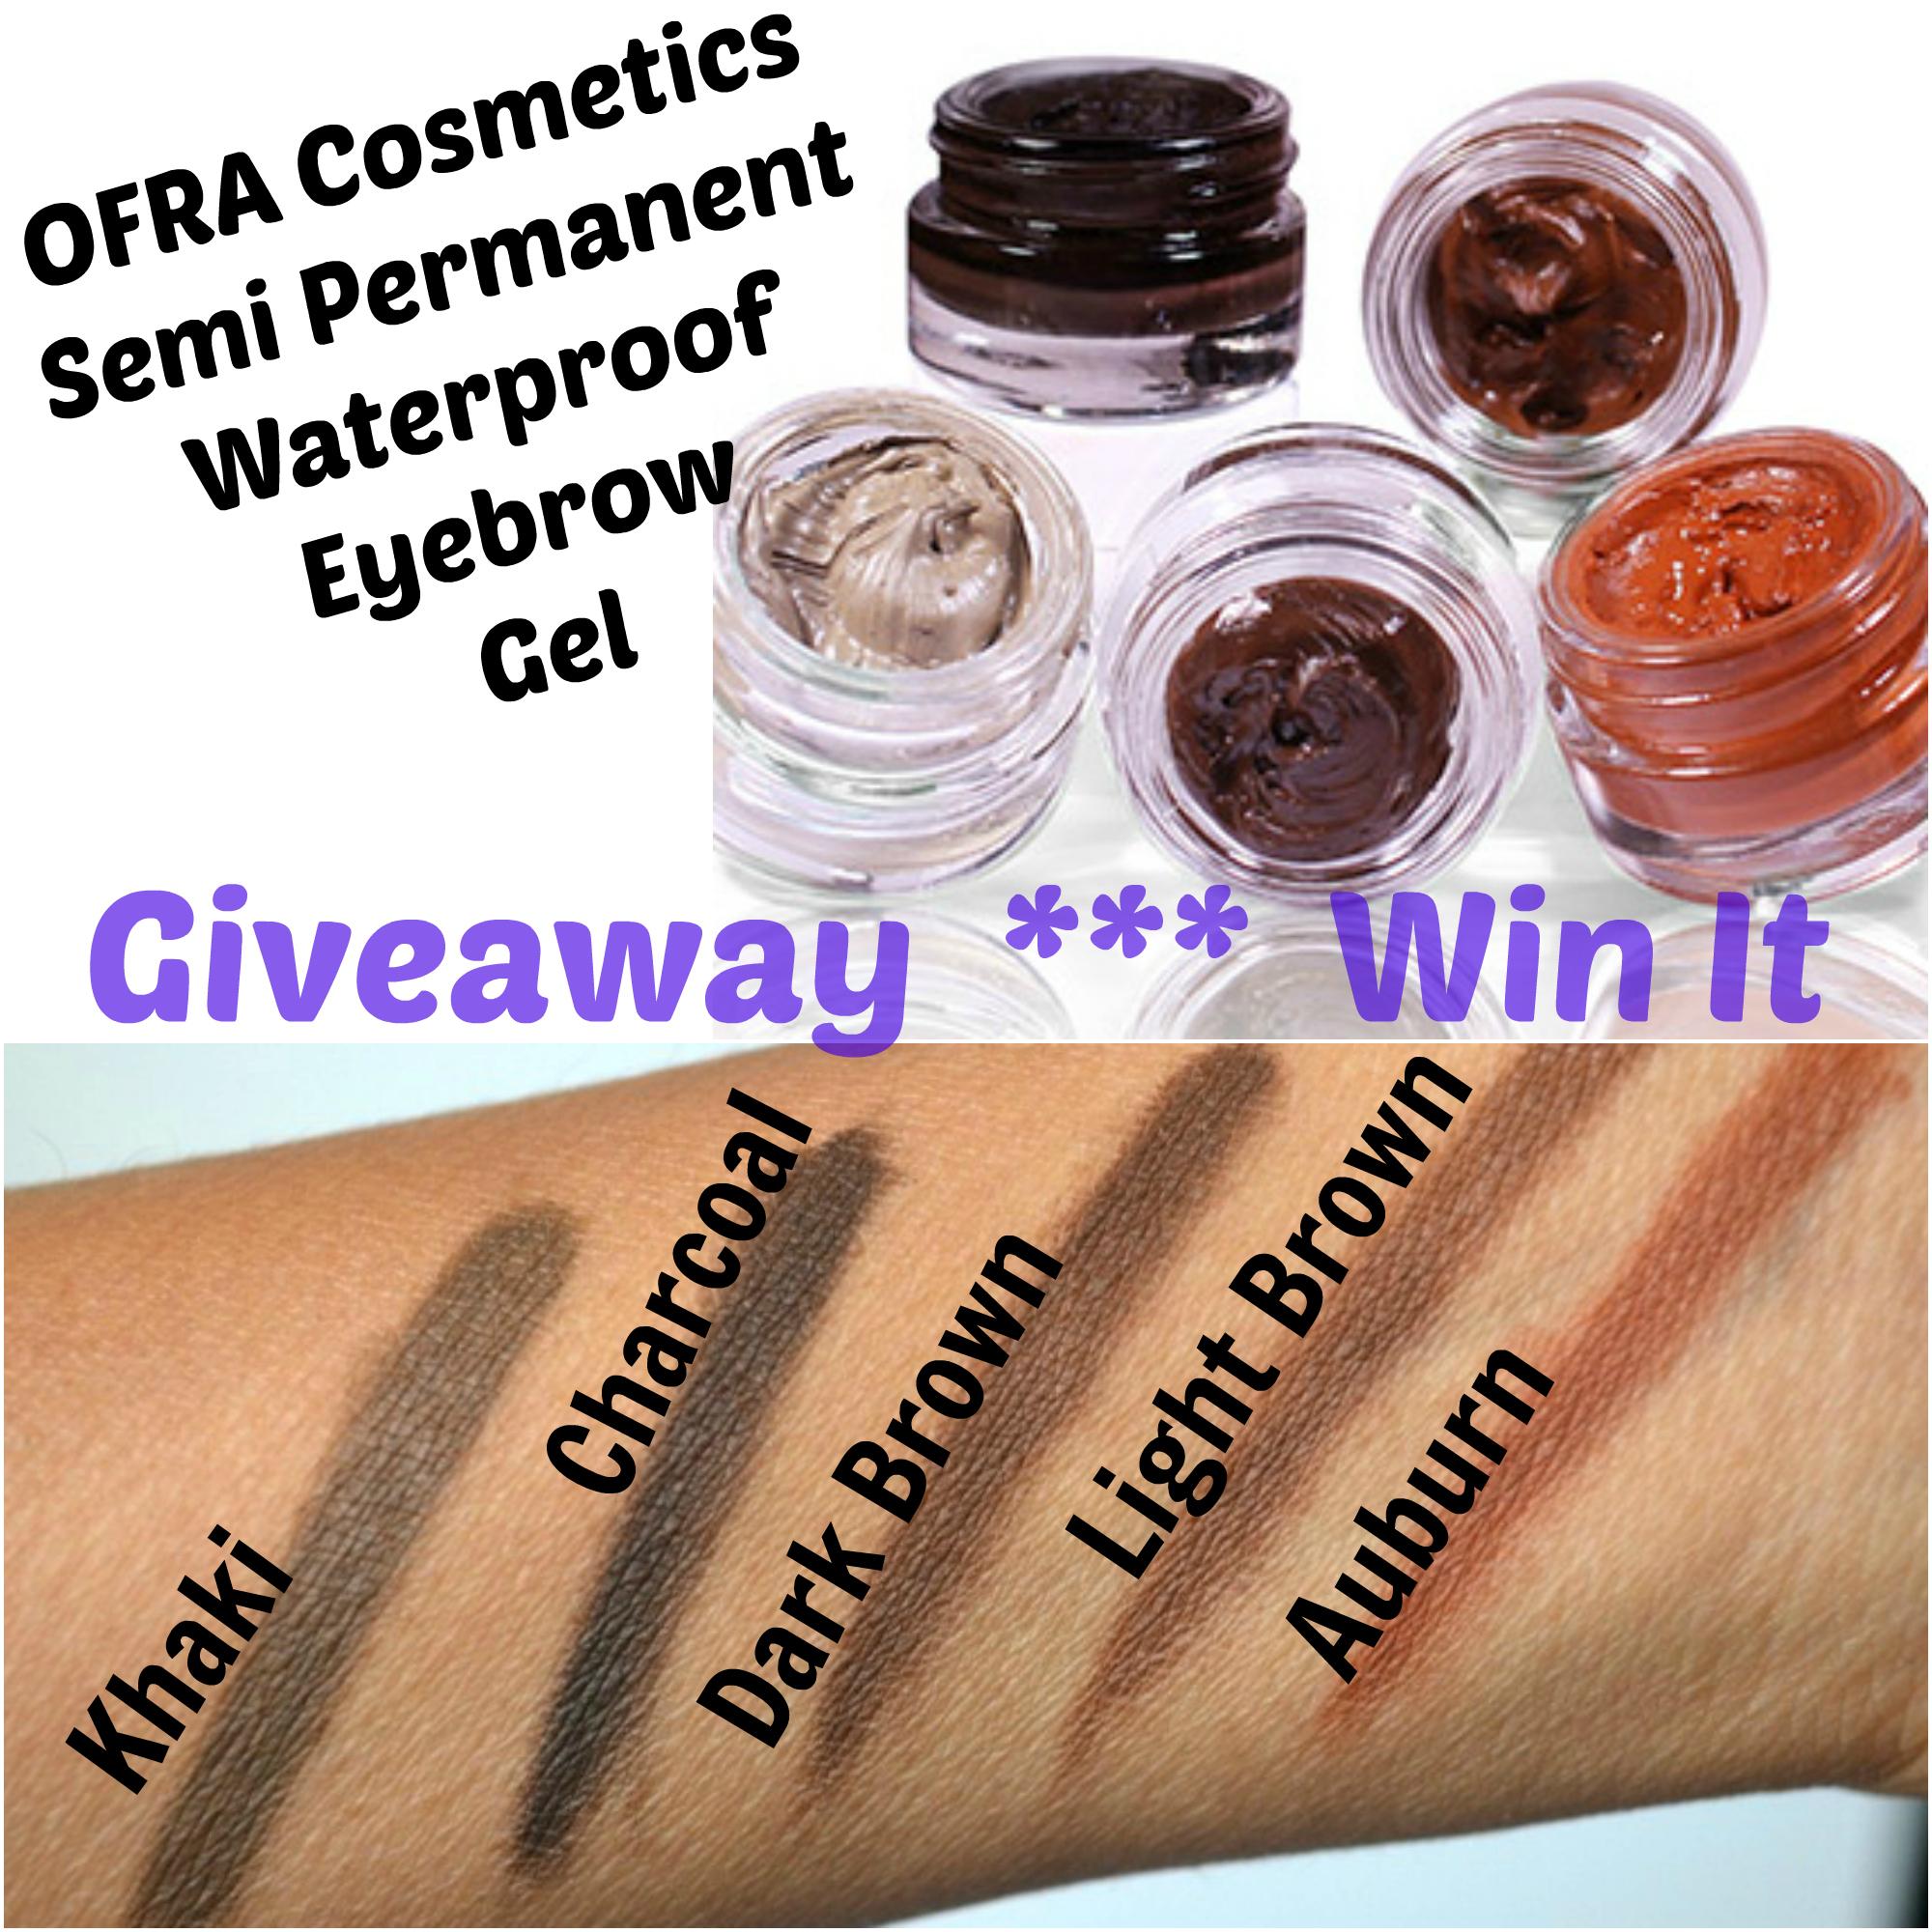 OFRA Cosmetics Semi Permanent Waterproof Eyebrow Gel Giveaway